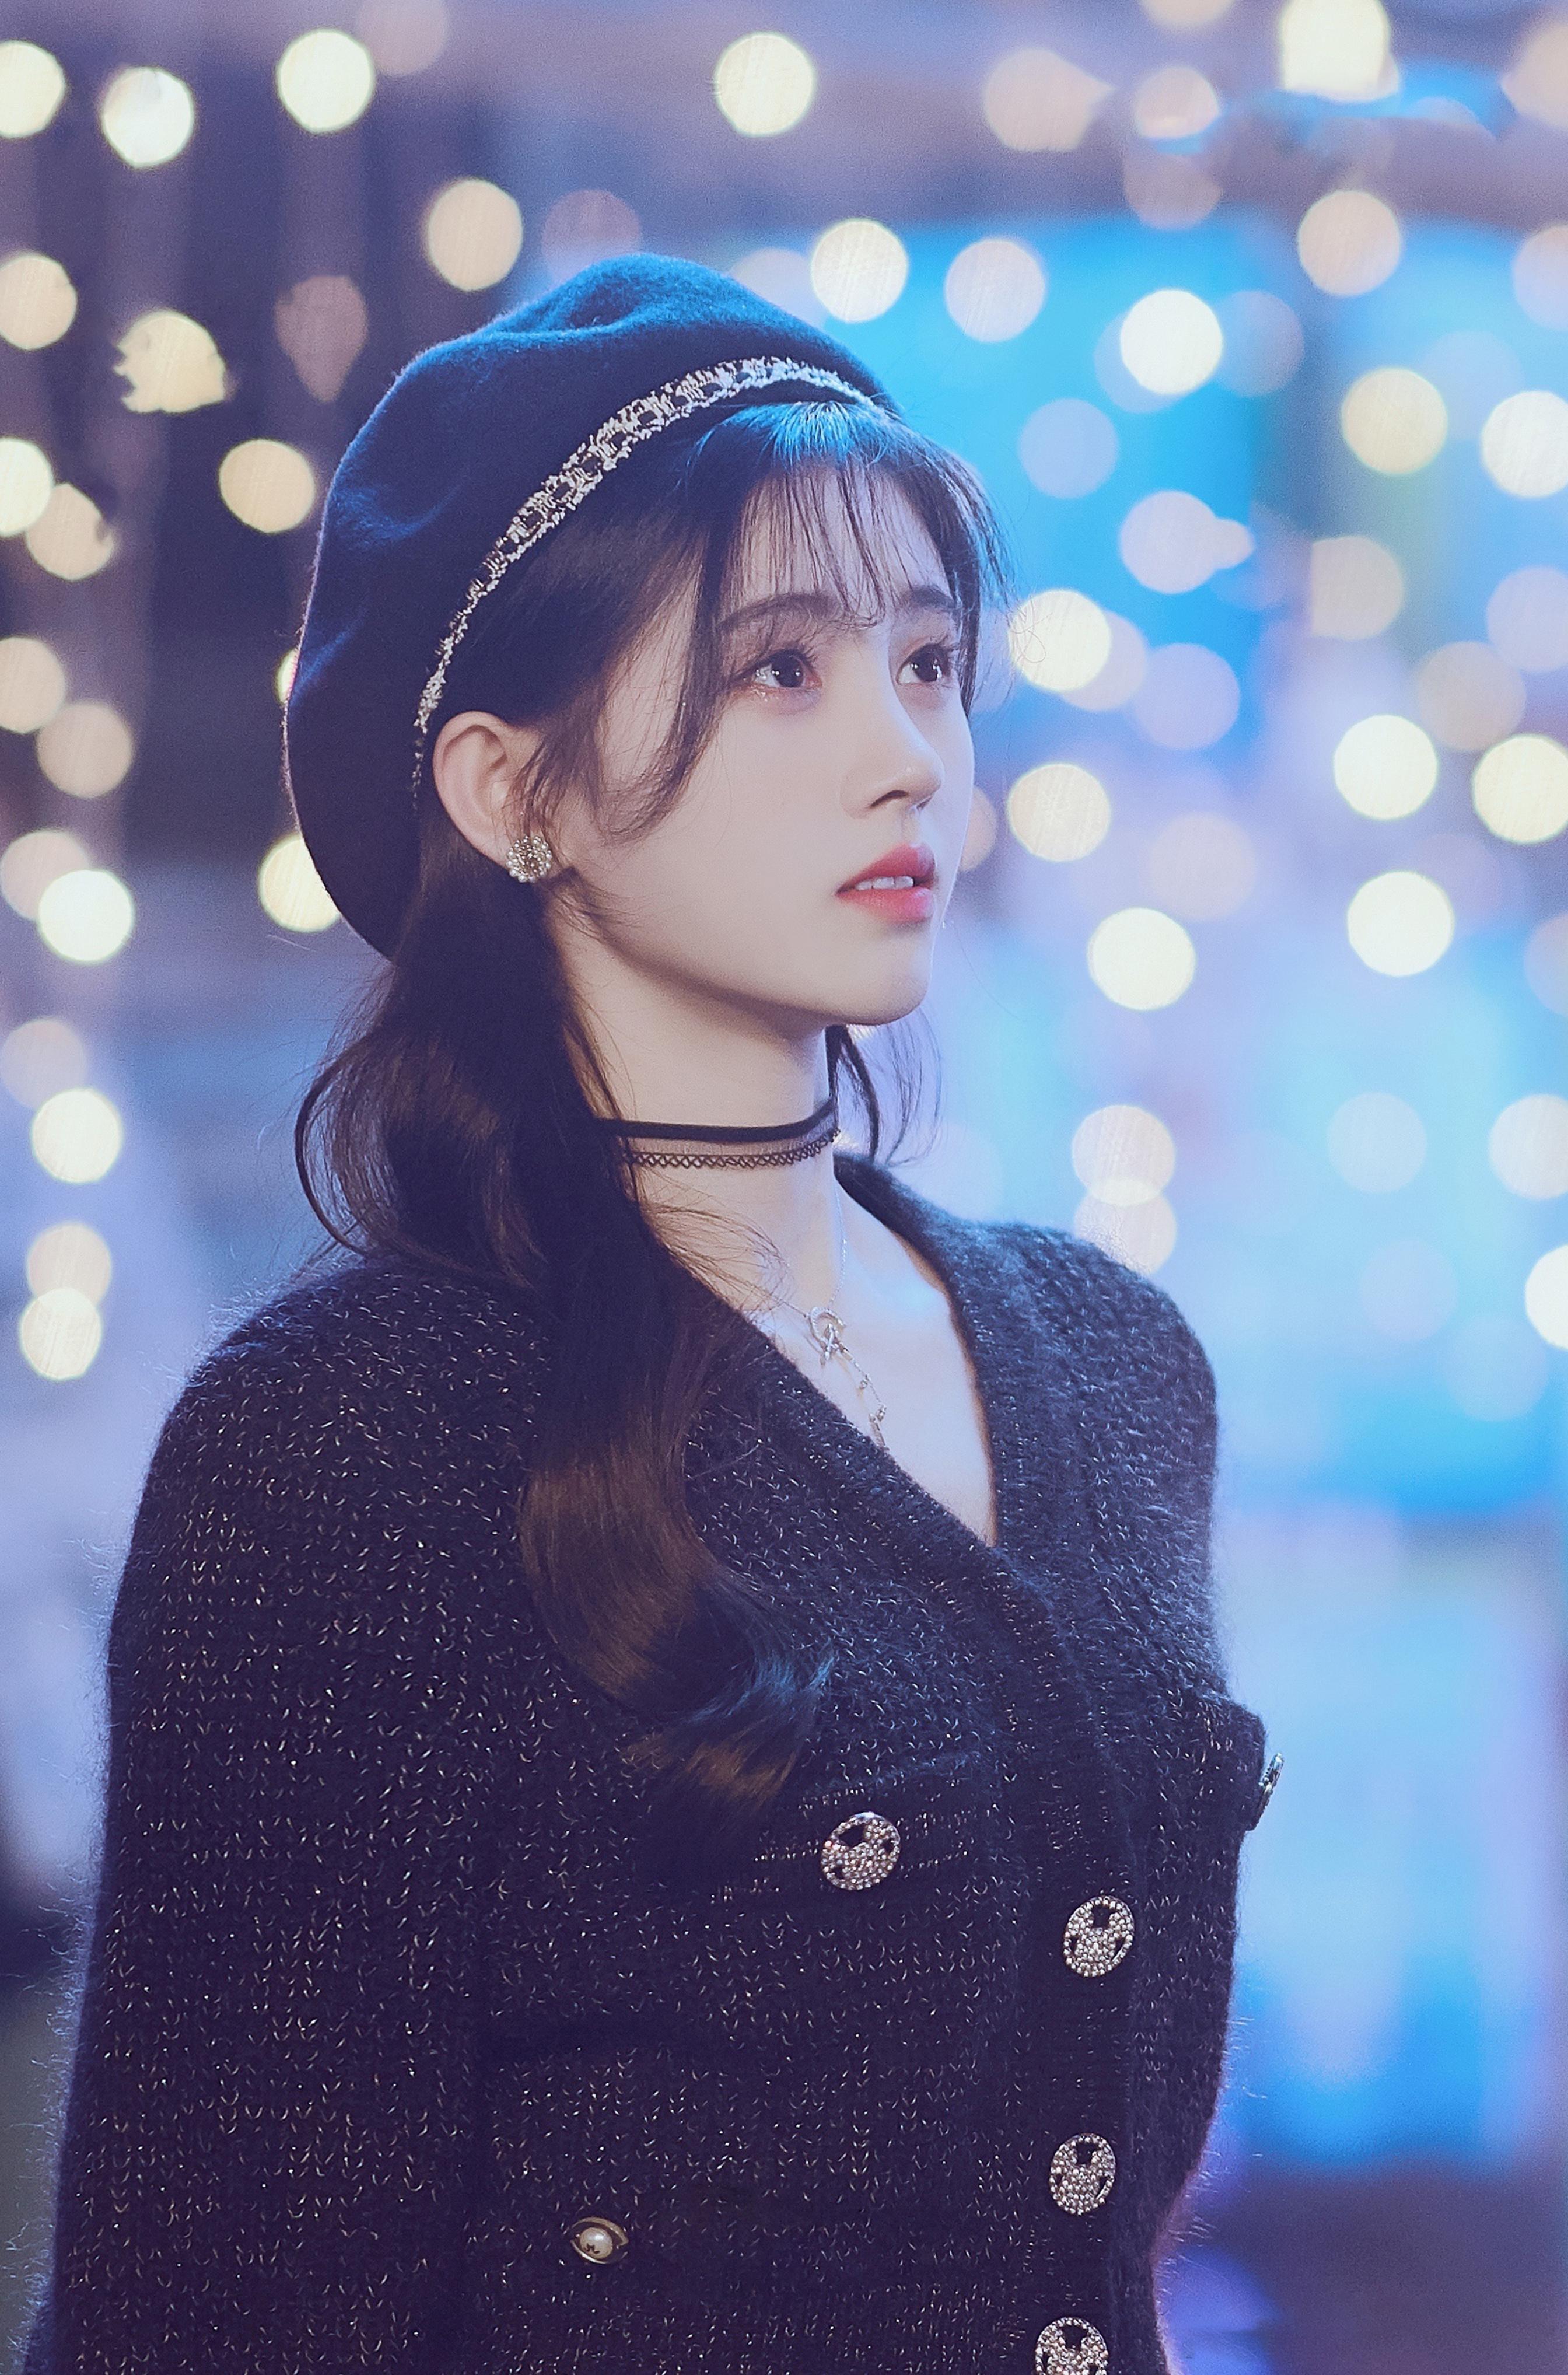 Kiku Ju Jingyi Actress Singer Women Chinese Asian Berets Black Hair Pearl Earrings Necklace Black Sw 2688x4071